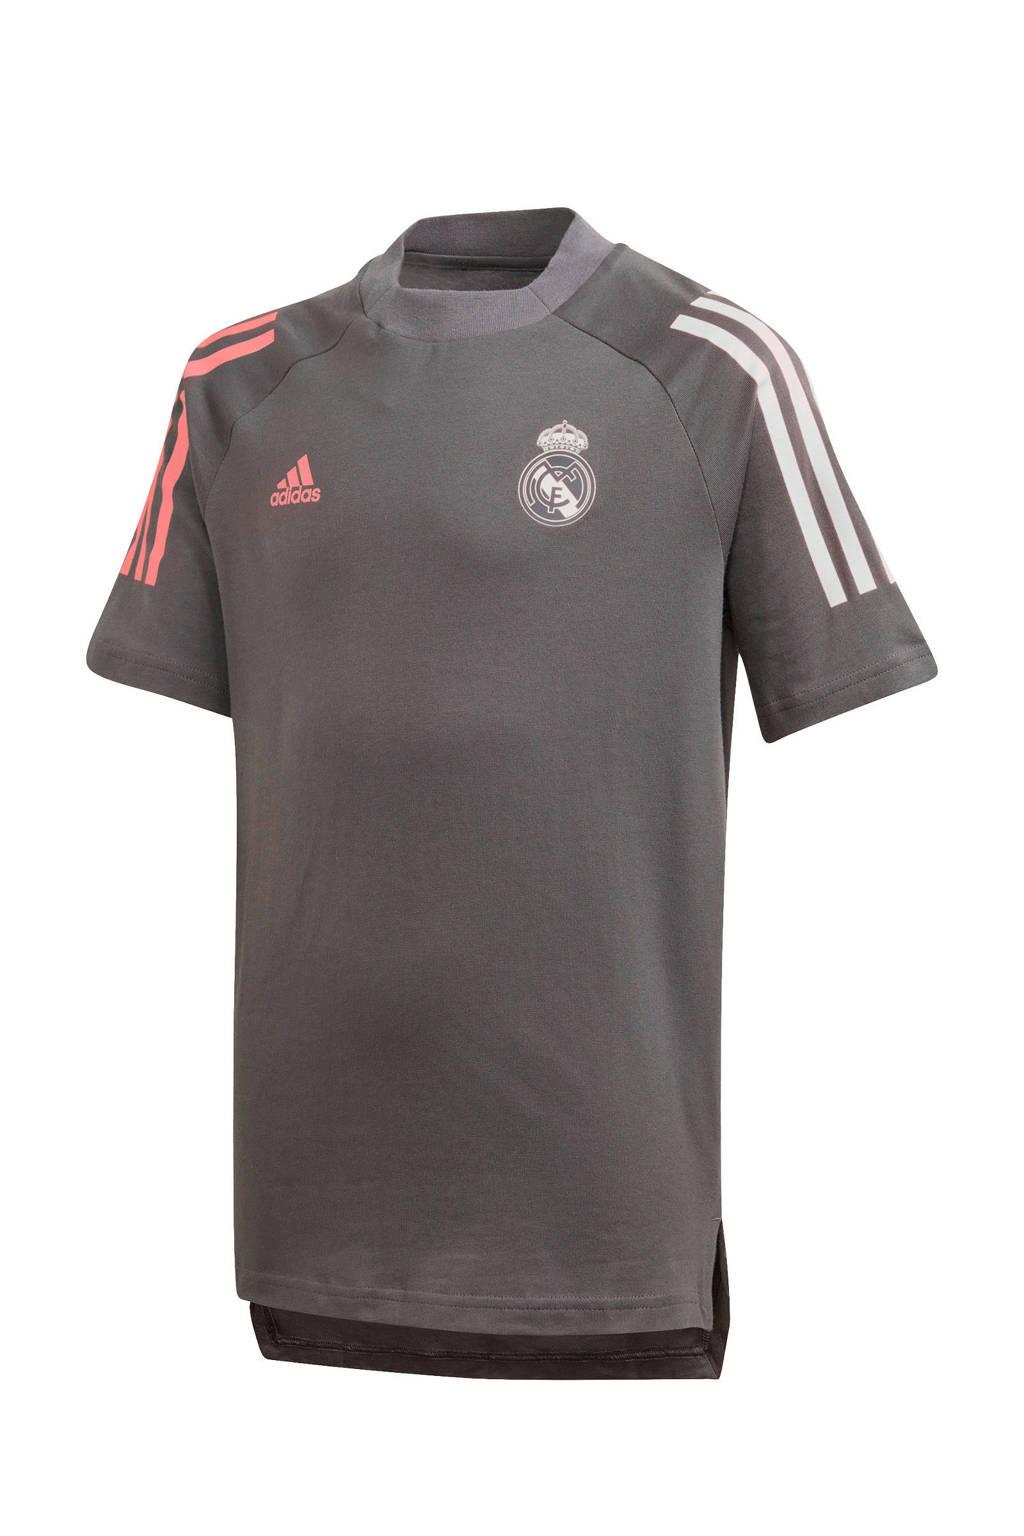 adidas Performance Junior Real Madrid voetbalshirt, Grijs